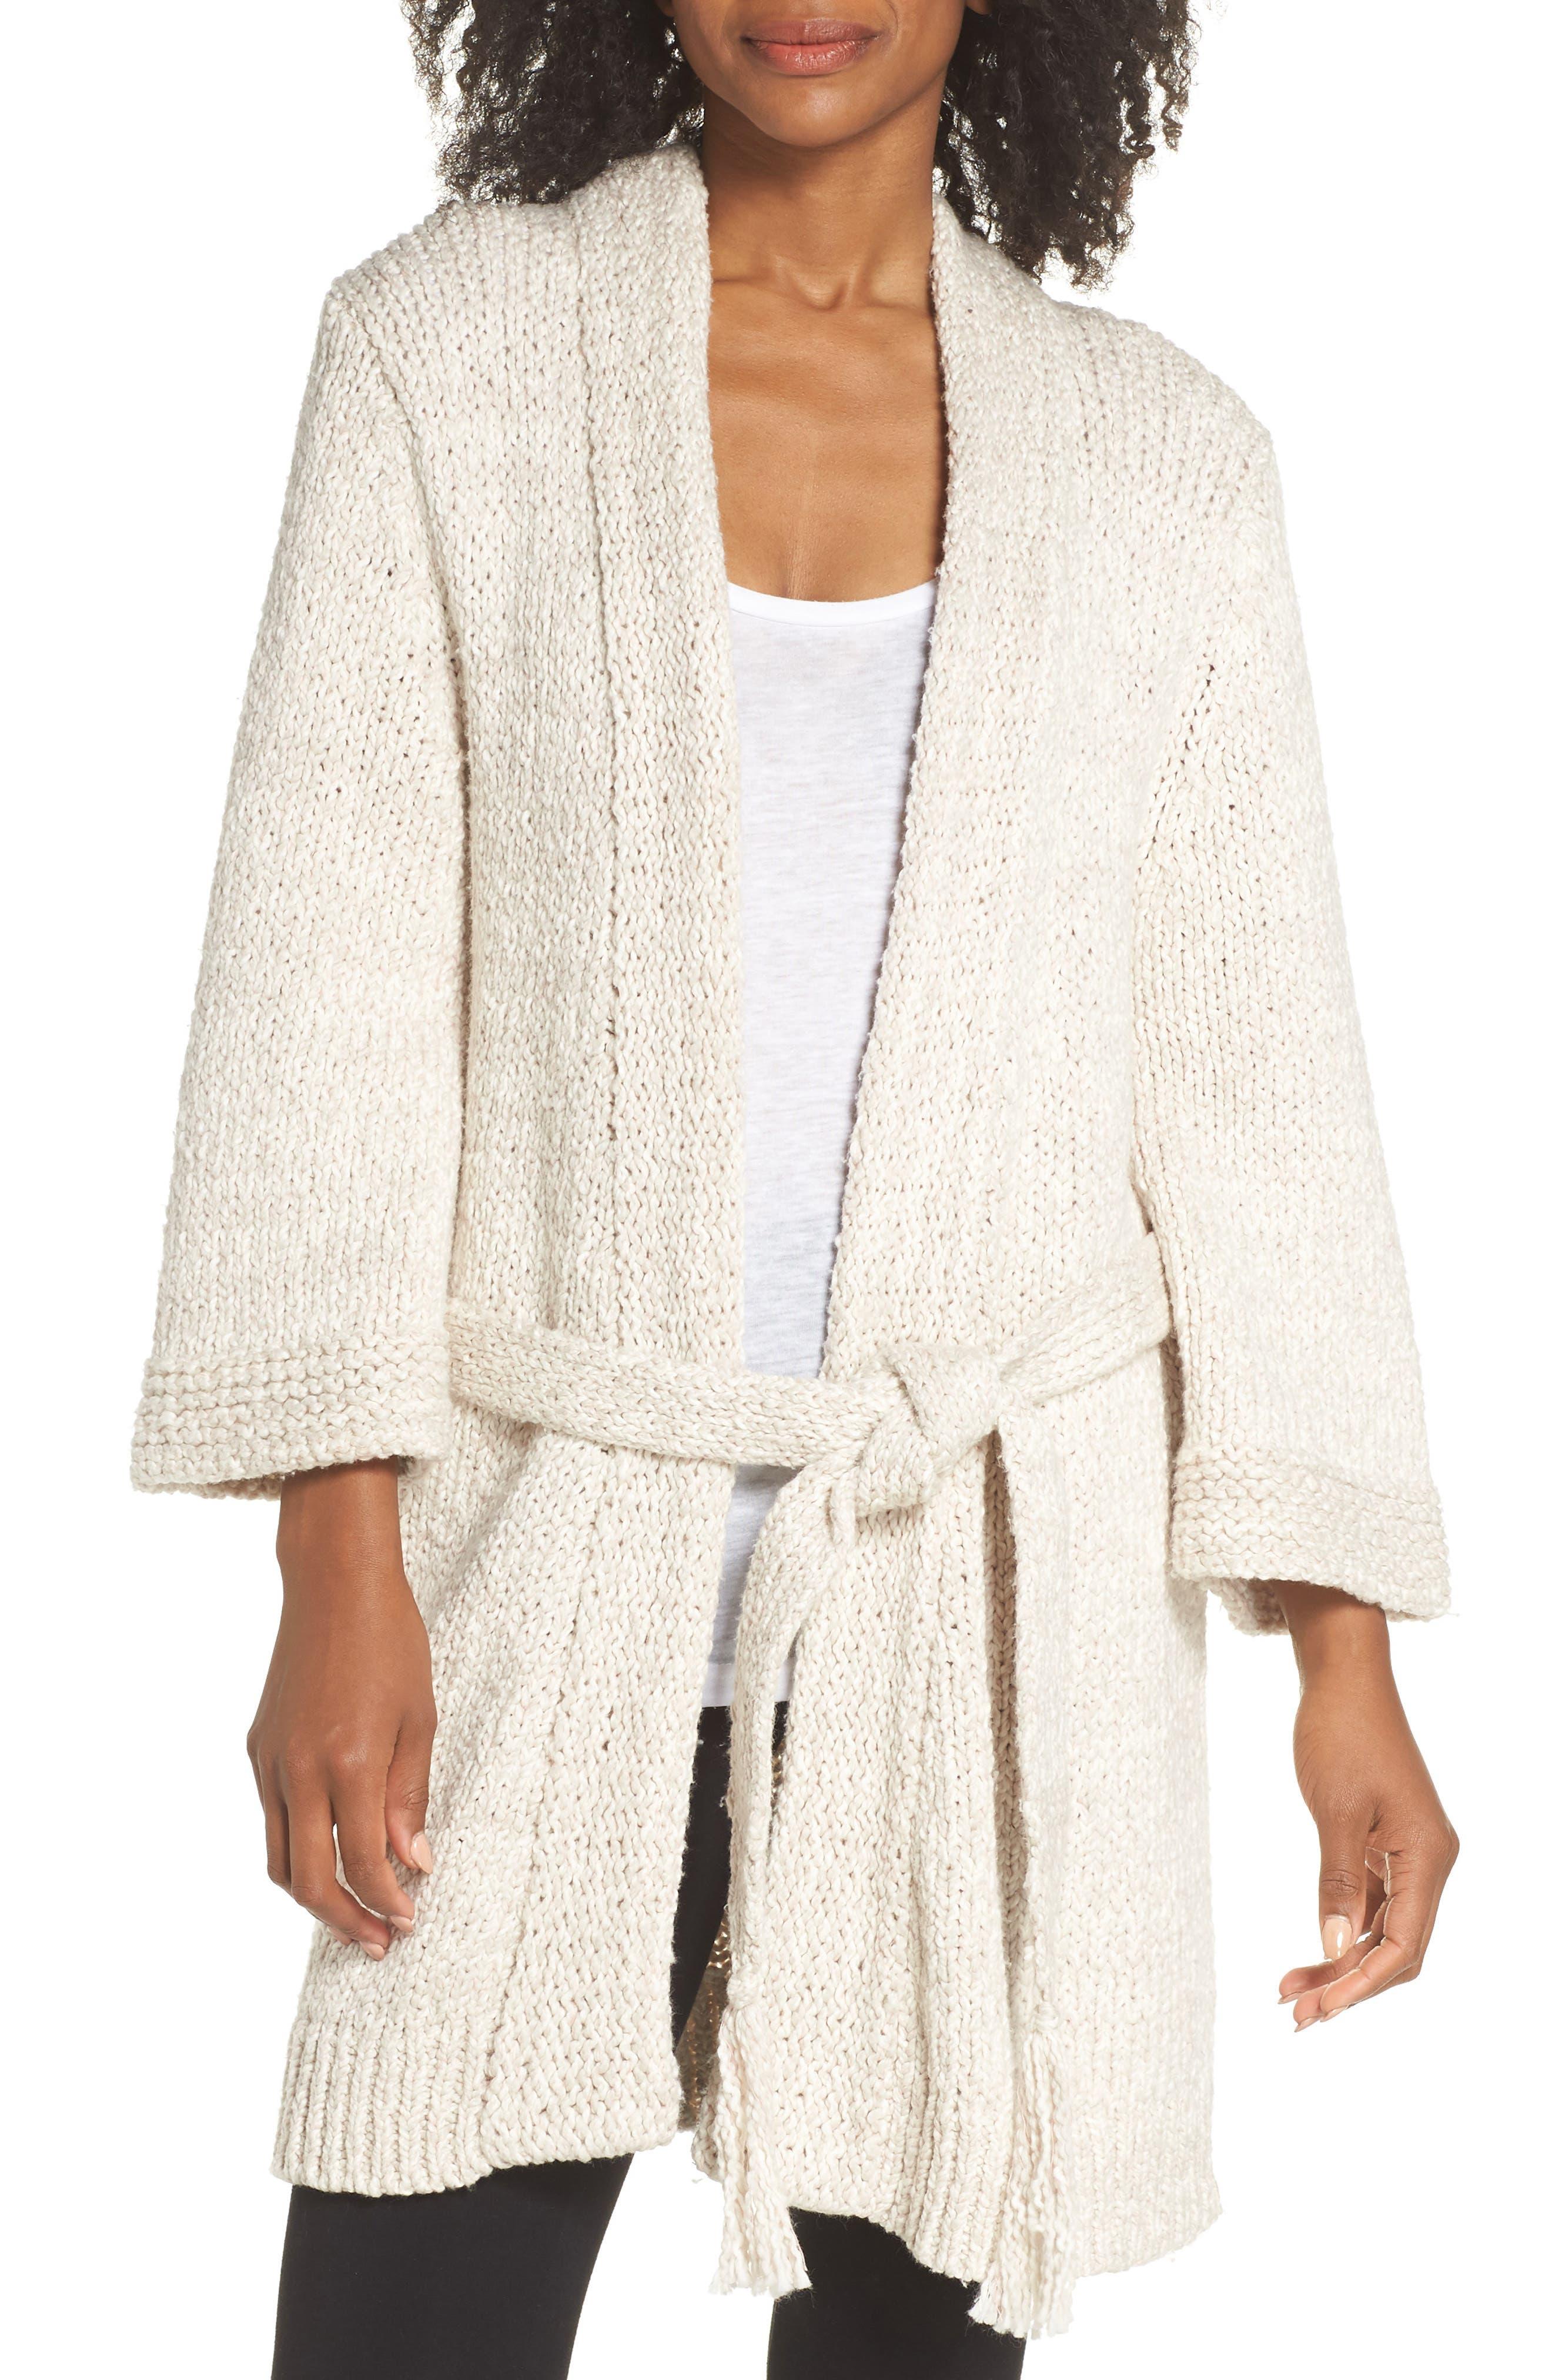 Kadia Organic Cotton Wrap,                         Main,                         color, 900